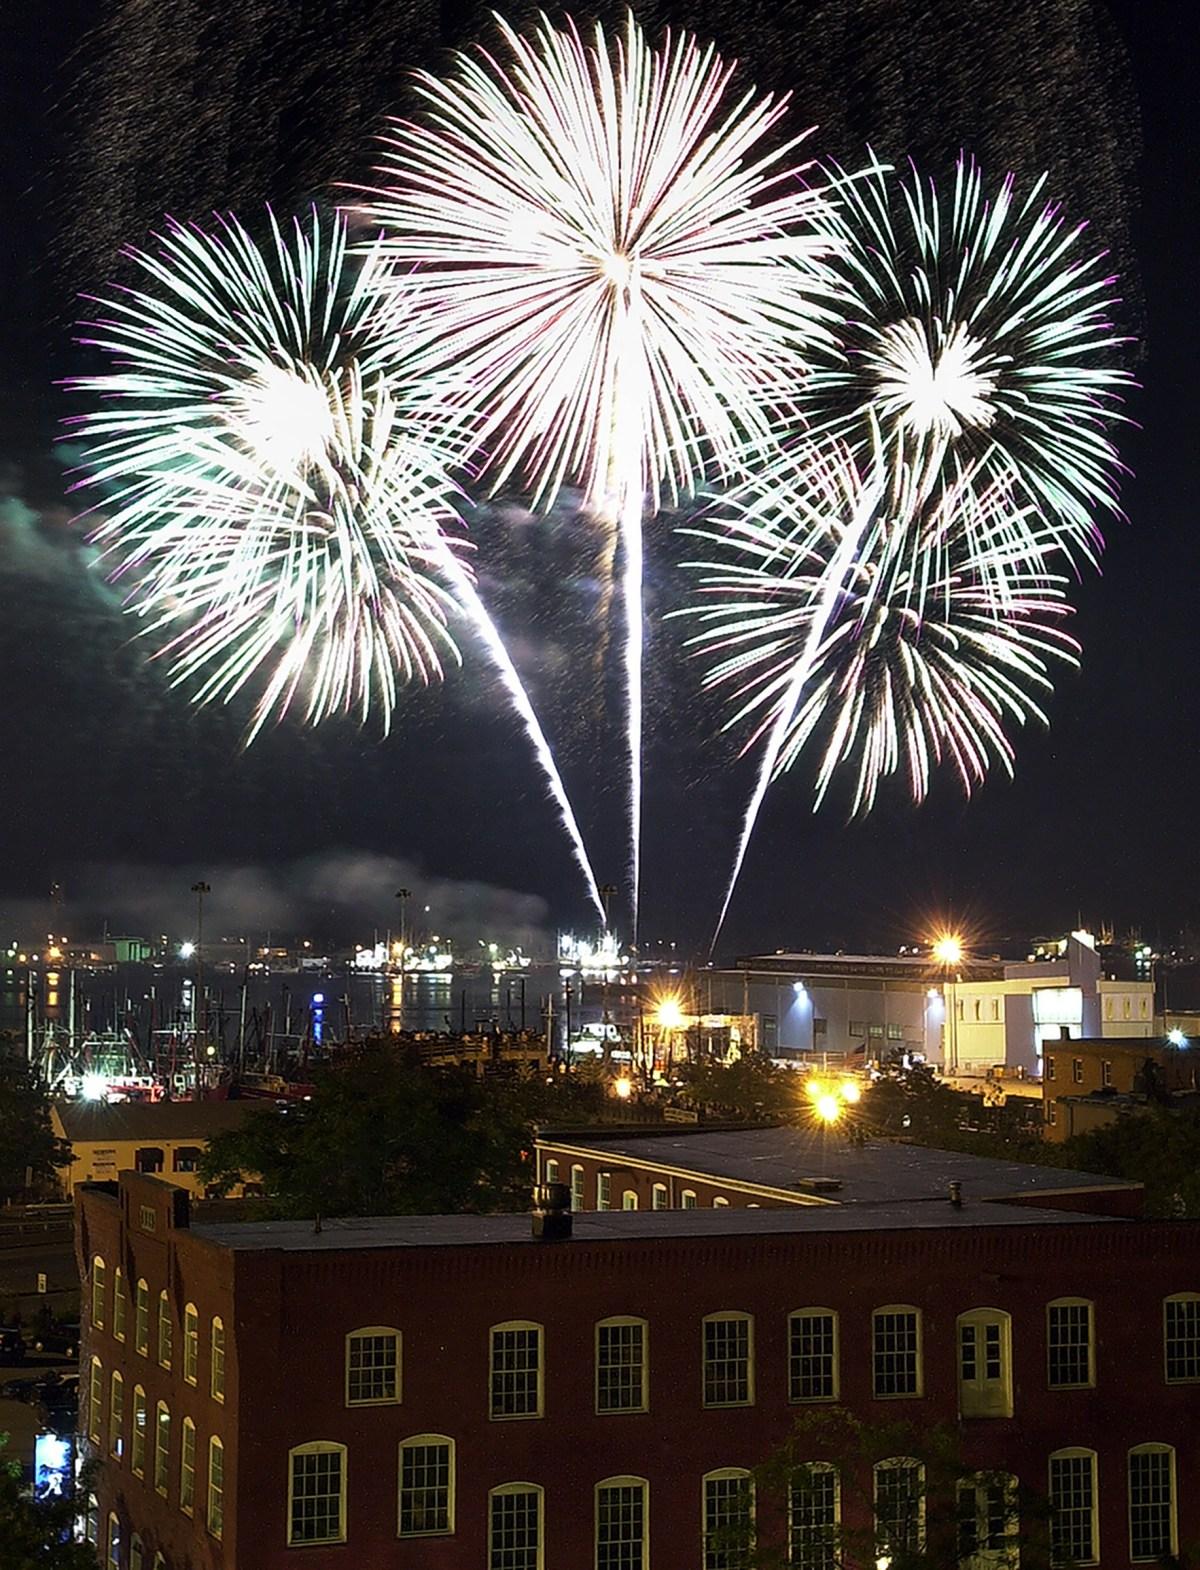 Fireworks light up the sky over New Bedford.